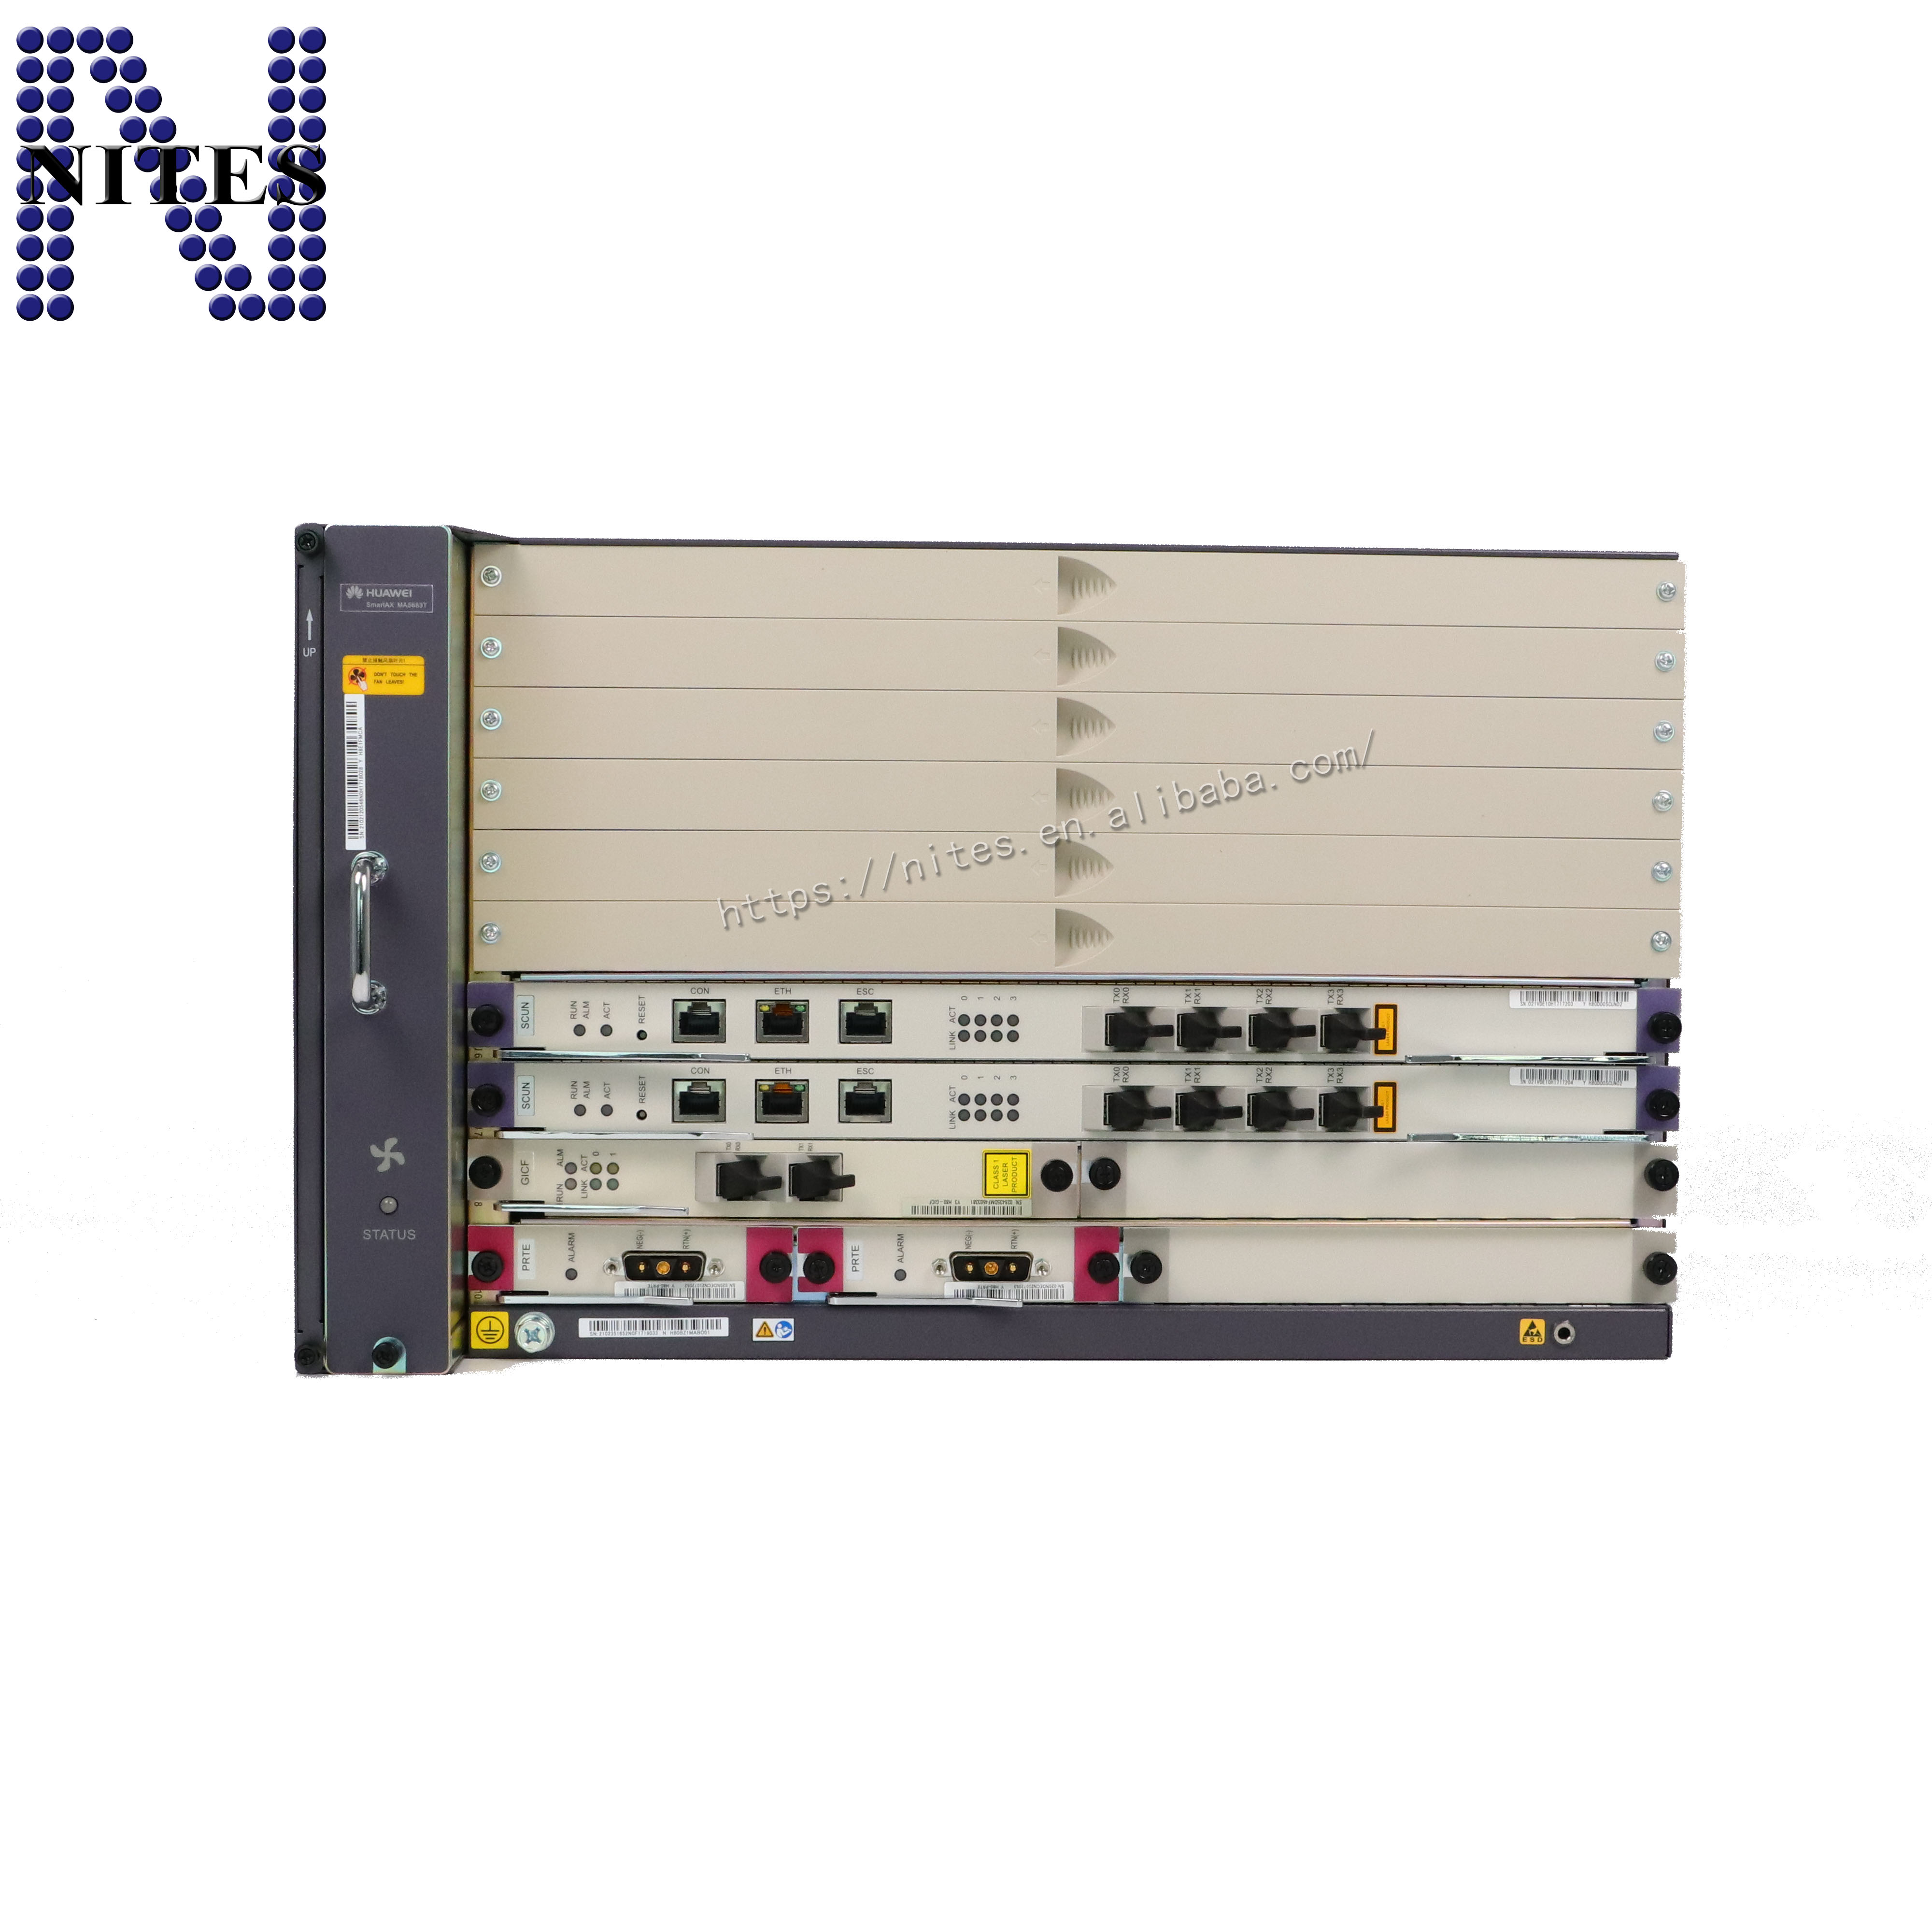 Ma5683t Sfp Modules For Ma5680t Ma5608t Olt Original Hua Wei 16 Ports Gpon Board With 16 Pcs Gpfd Class C